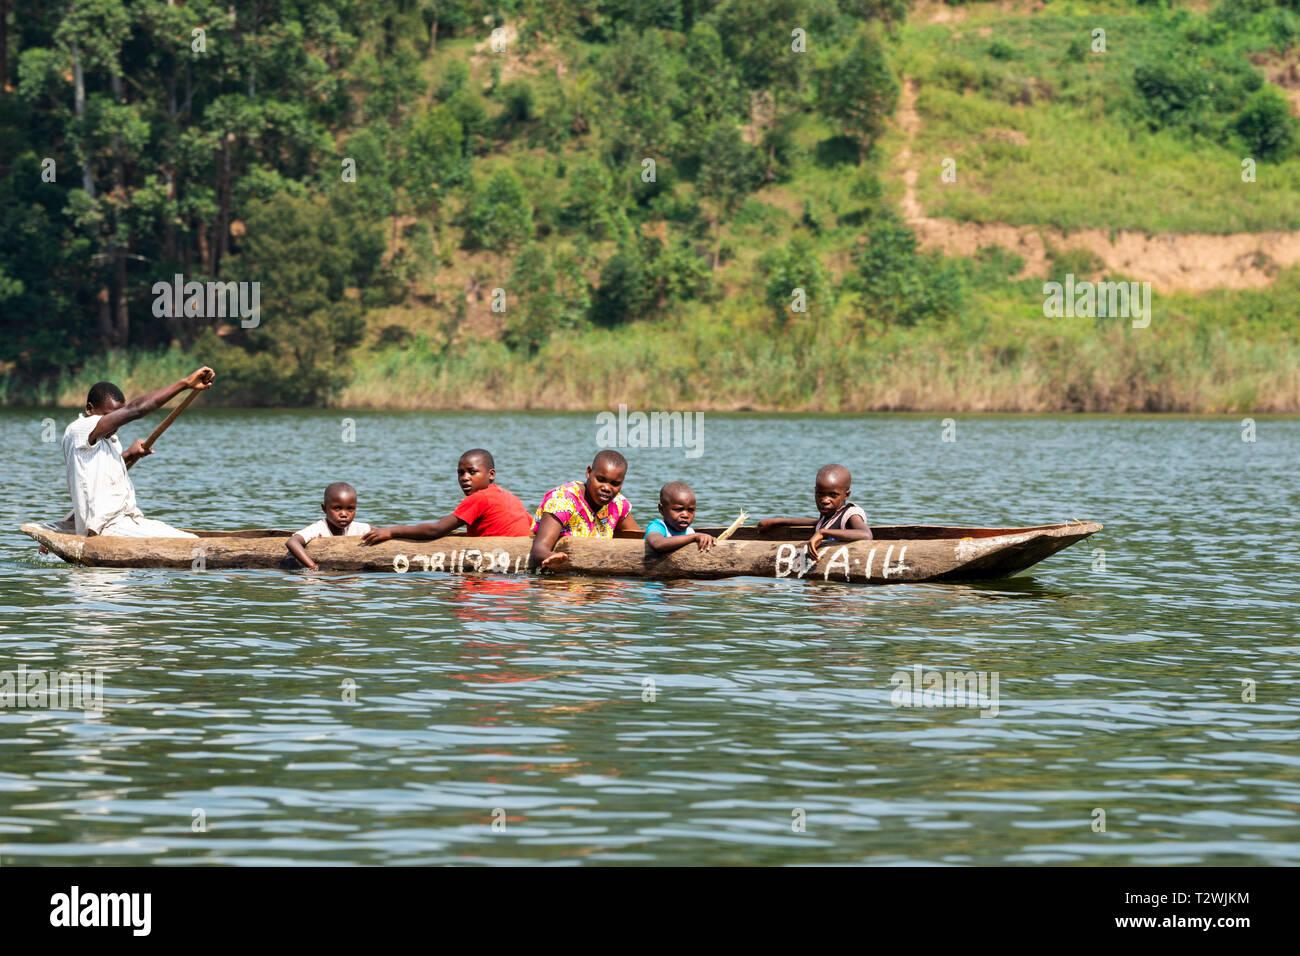 Boatman ferrying passengers in dugout canoe on Lake Bunyonyi in South West Uganda, East Africa - Stock Image